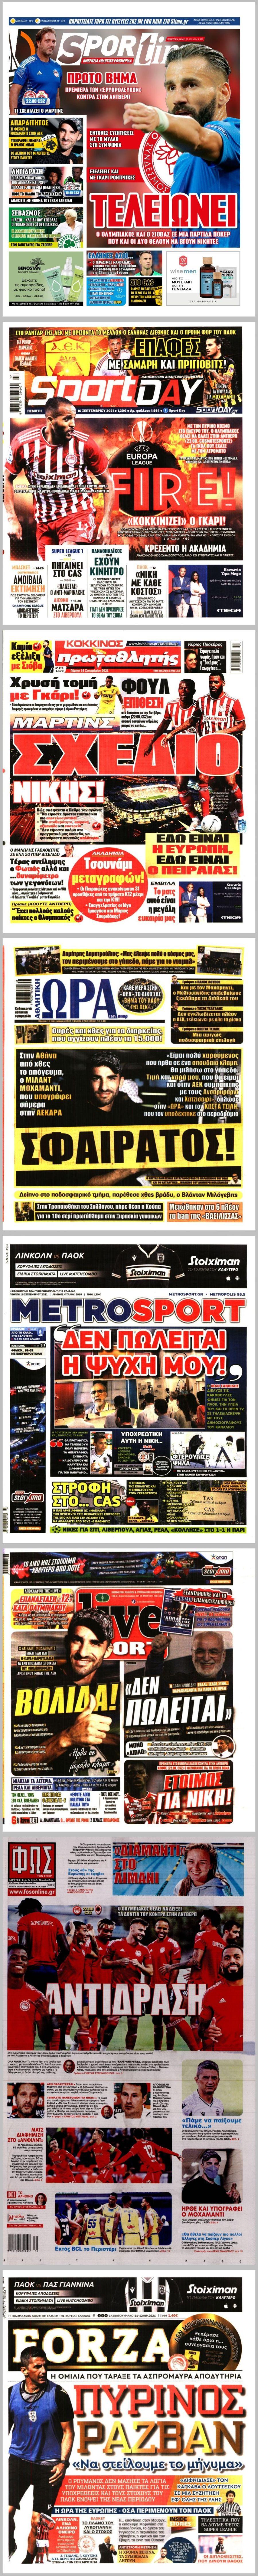 News1 5